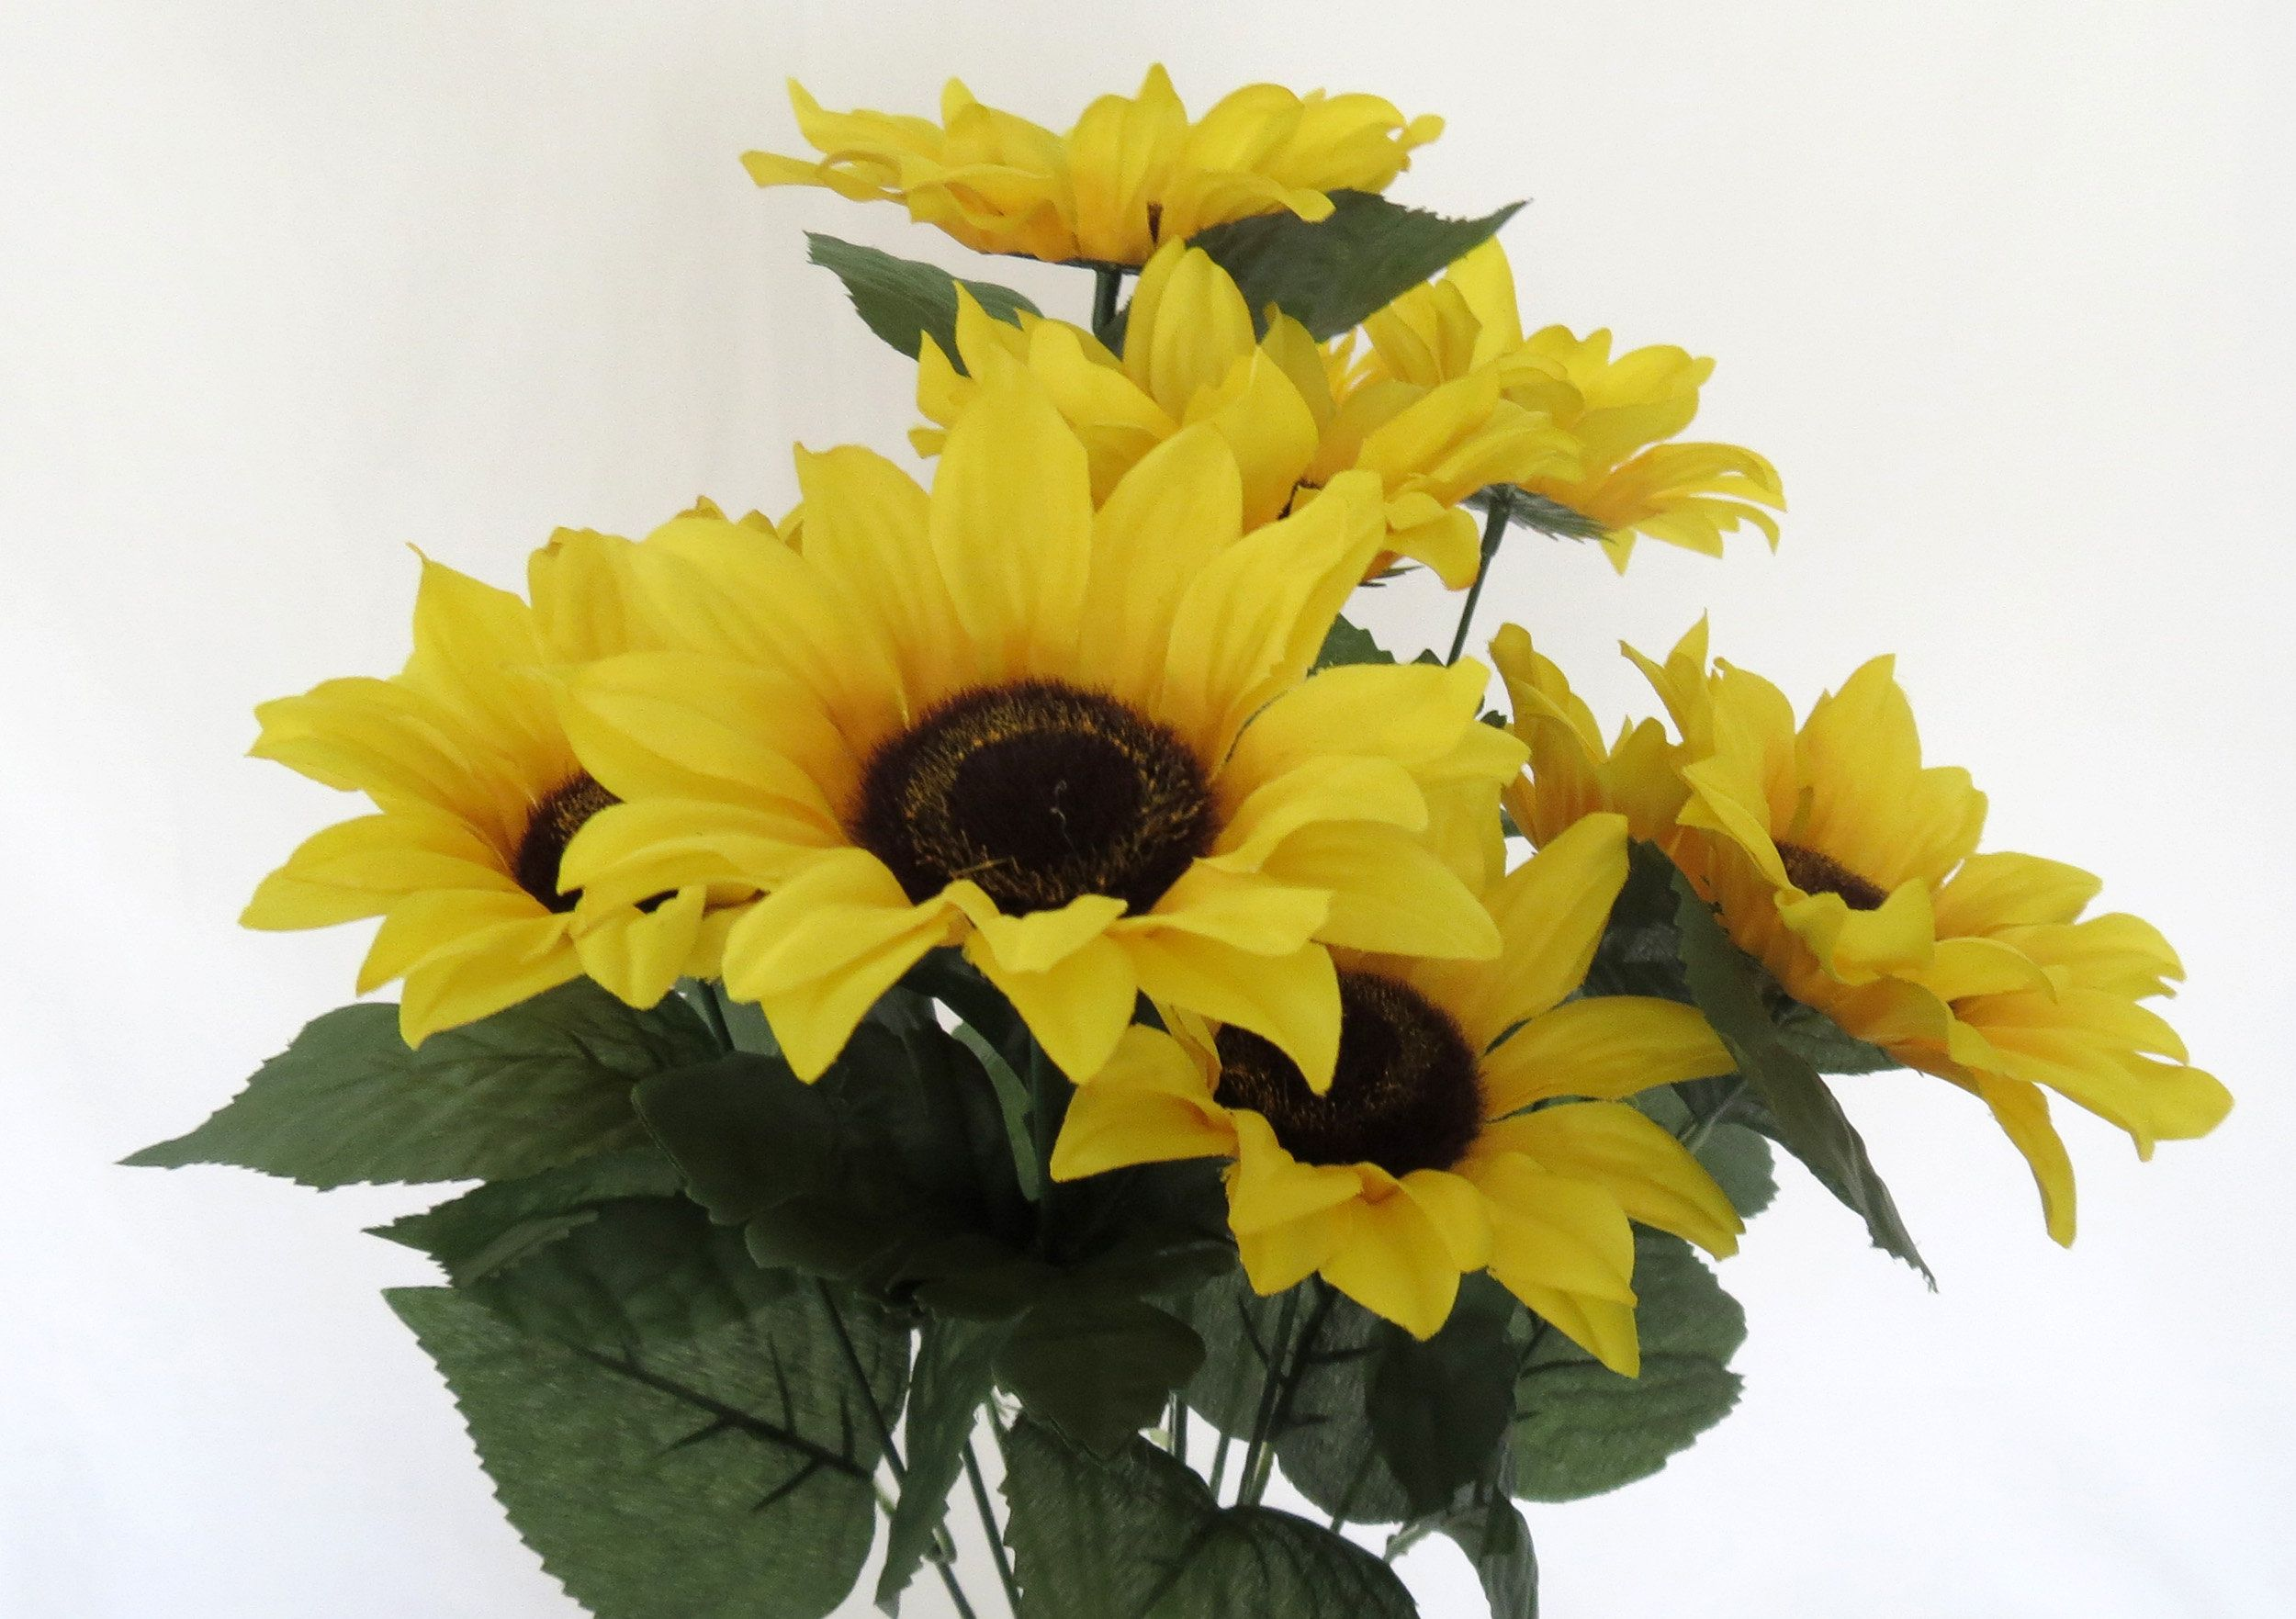 Sunflower Floral Bush Faux Sunflowers Artificial Yellow Flowers Home Decor Floral Supplies Fake Sunflowers Faux Sunflower Artificial Flowers Floral Supplies